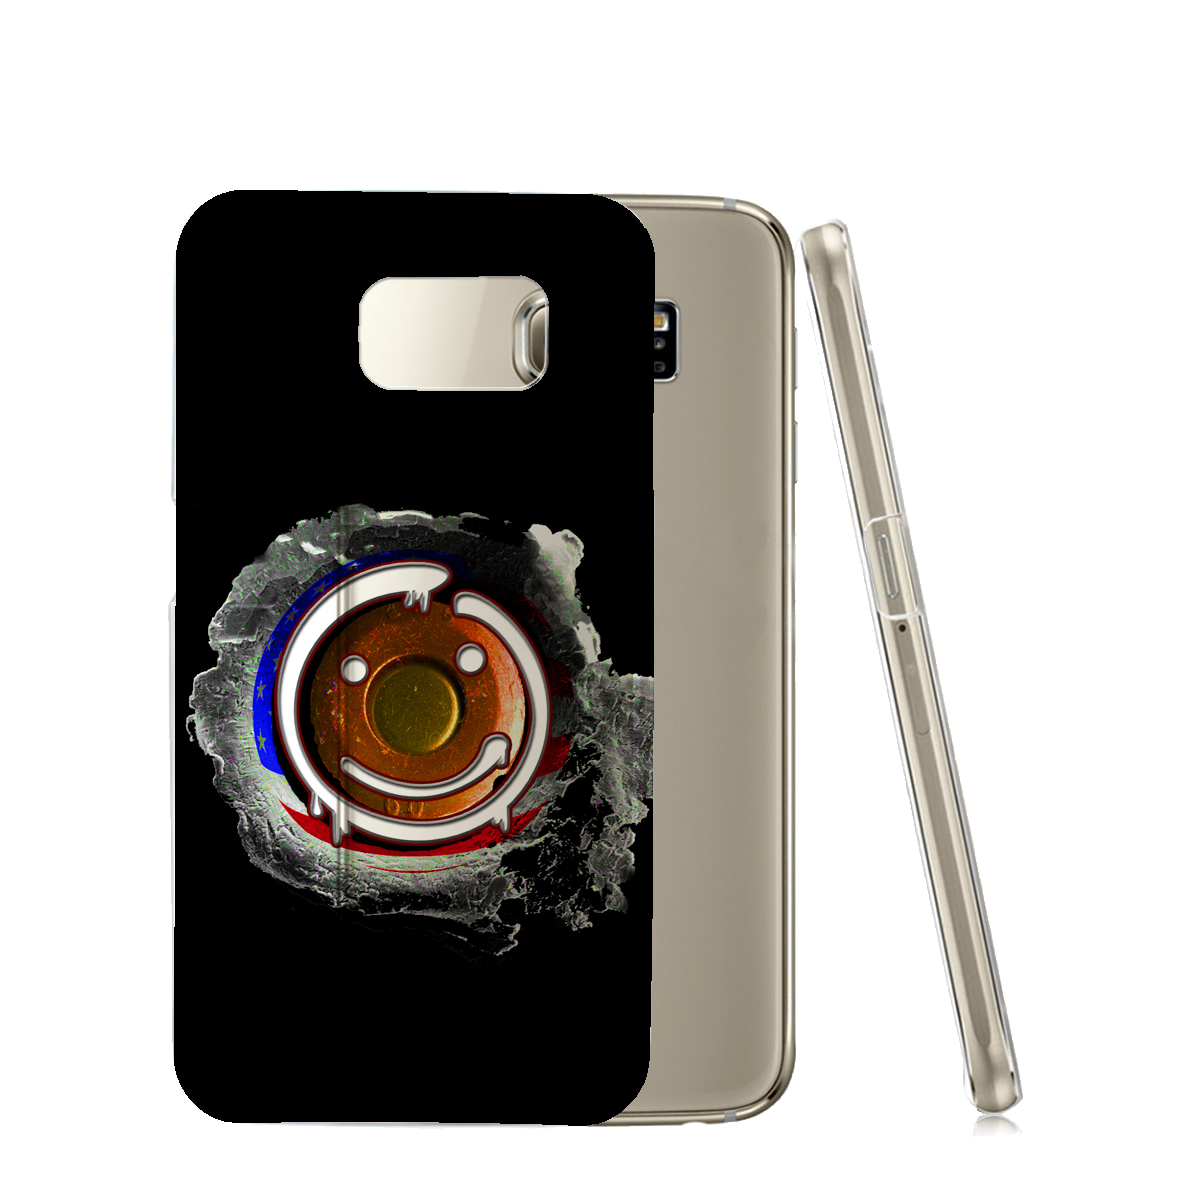 KuzmarK™ Samsung Galaxy S6 Clear Cover Case - Happy Face American Flag Bullet